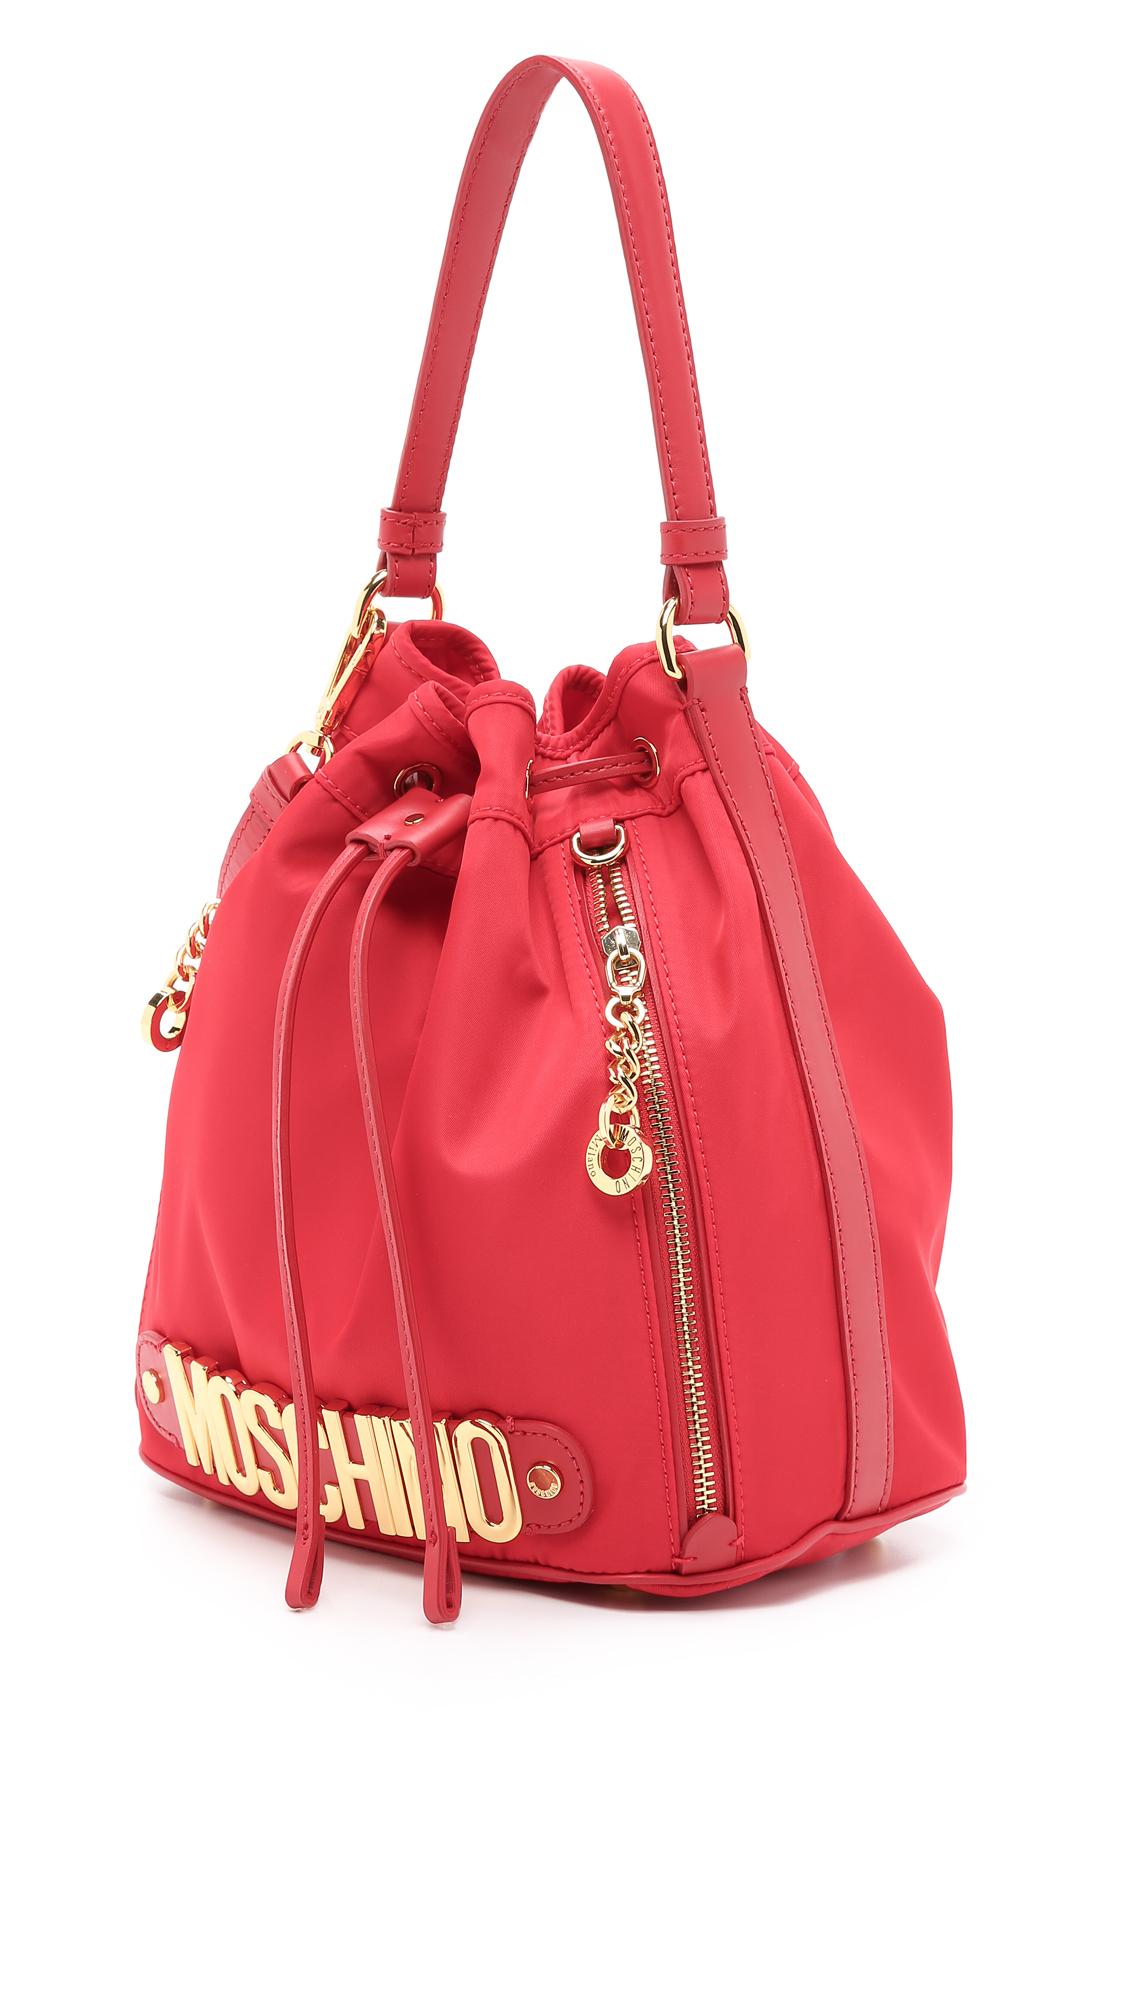 9dffd0e2b3e94 Moschino Nylon Bucket Bag - Red in Red - Lyst